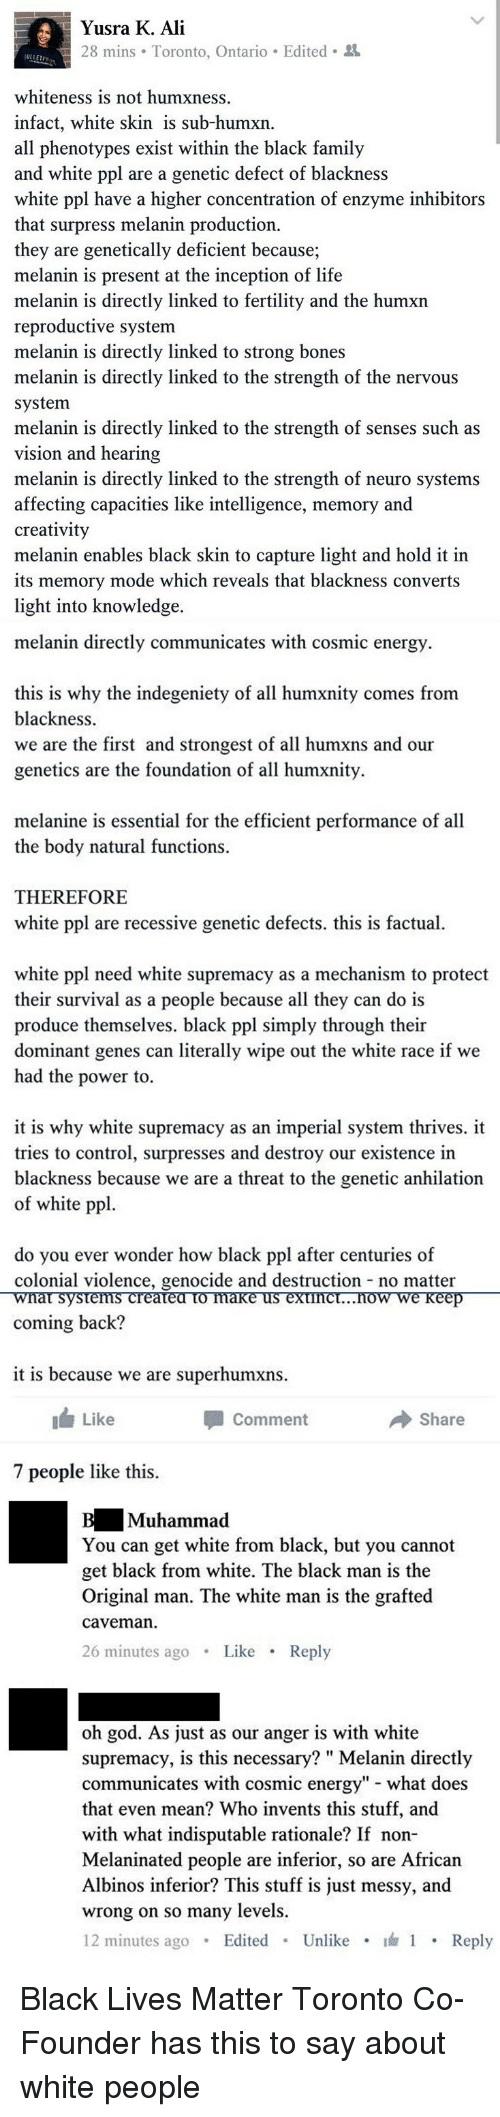 yusra-k-ali-edited-whiteness-is-not-humxness-nfact-white-2996490